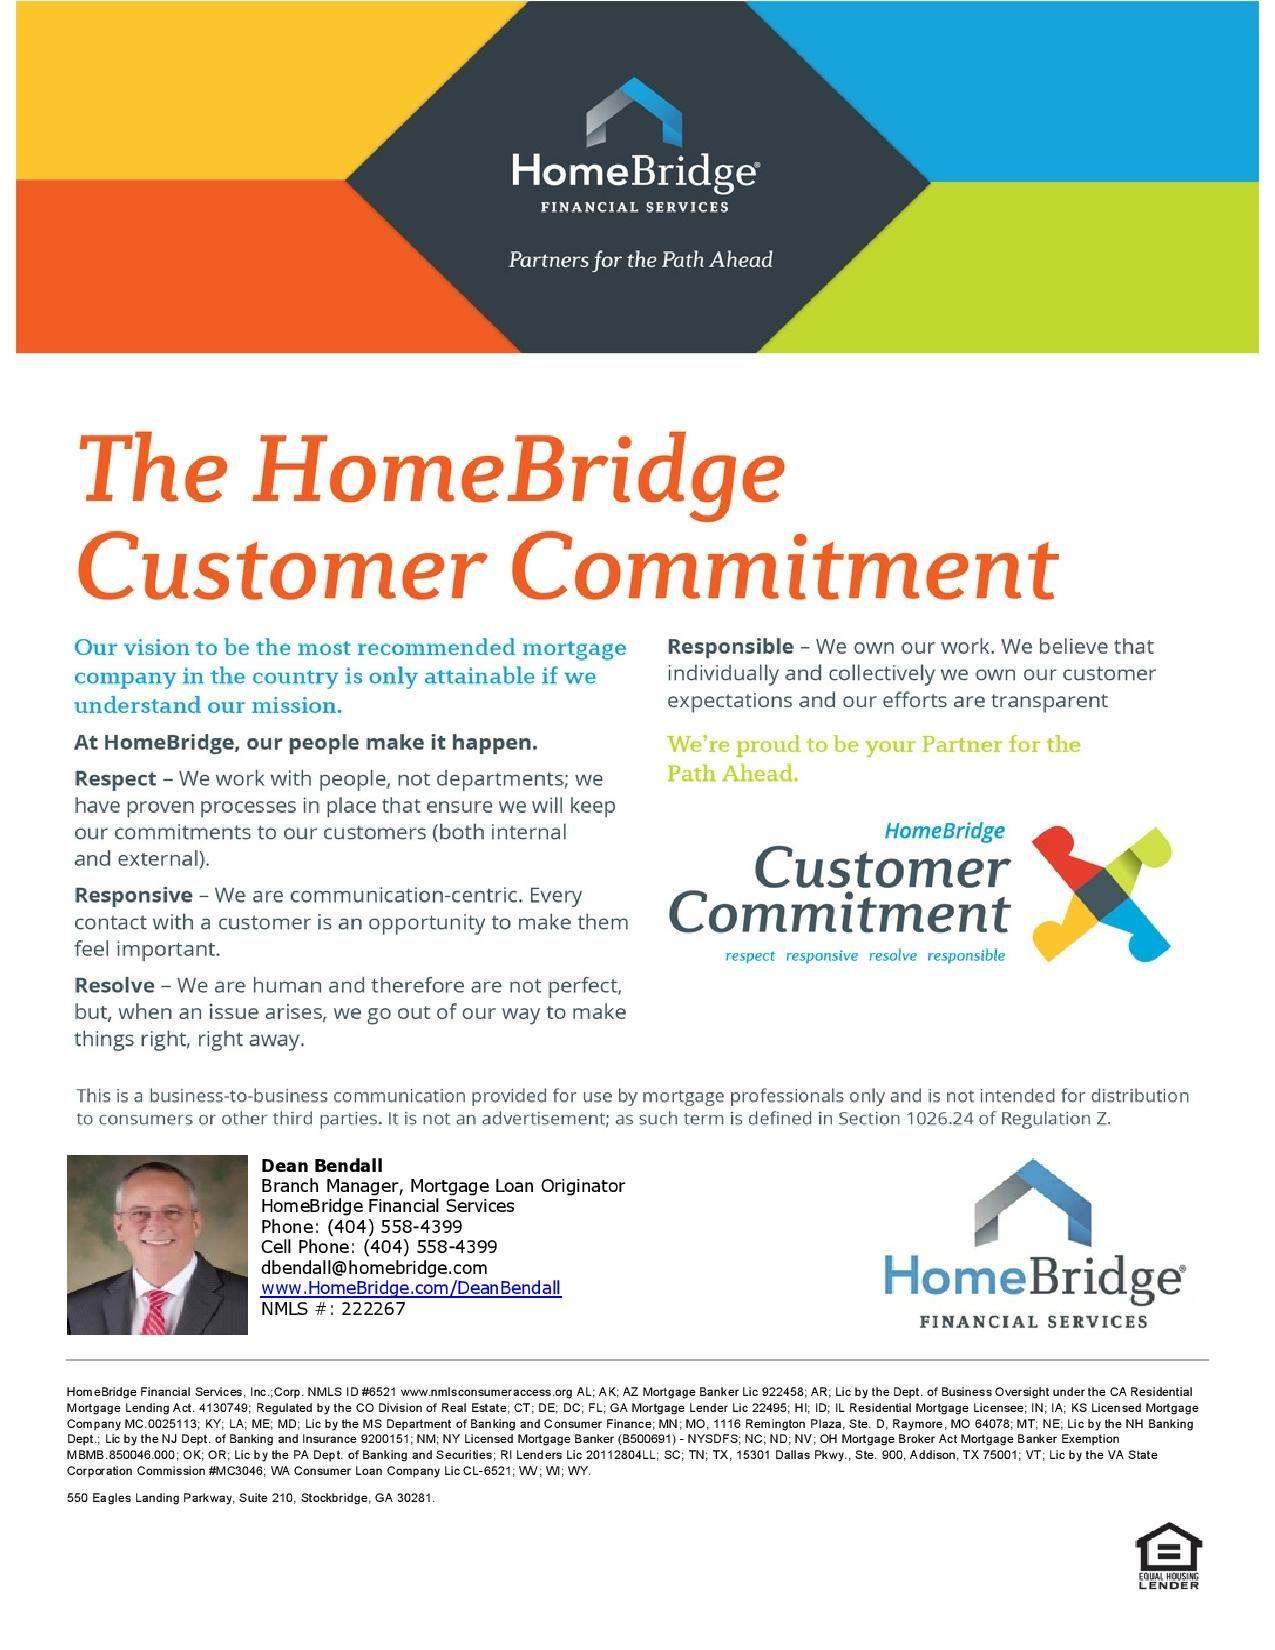 HomeBridge Financial Services, Inc. Dean Bendall, Mortgage